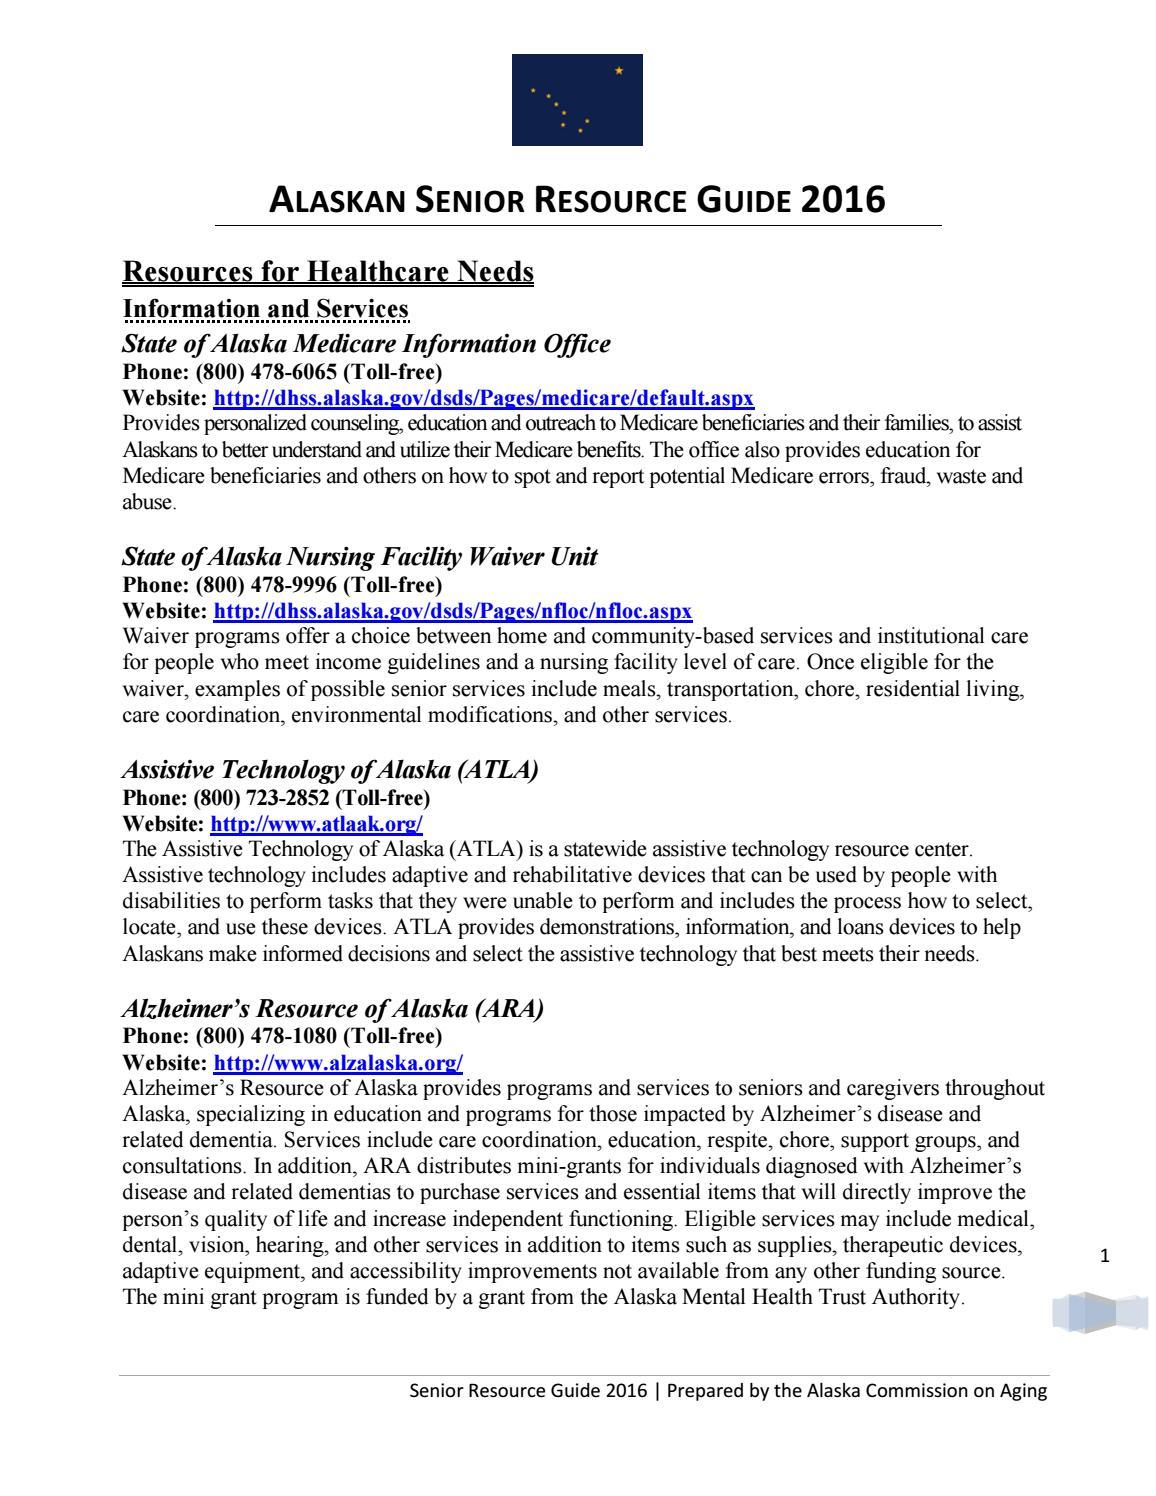 Ak_senior_resource_guide_2016 5 Months Ago Linksadrcwasilla How To Apply  Senior Center Assistance Programs_thumbg